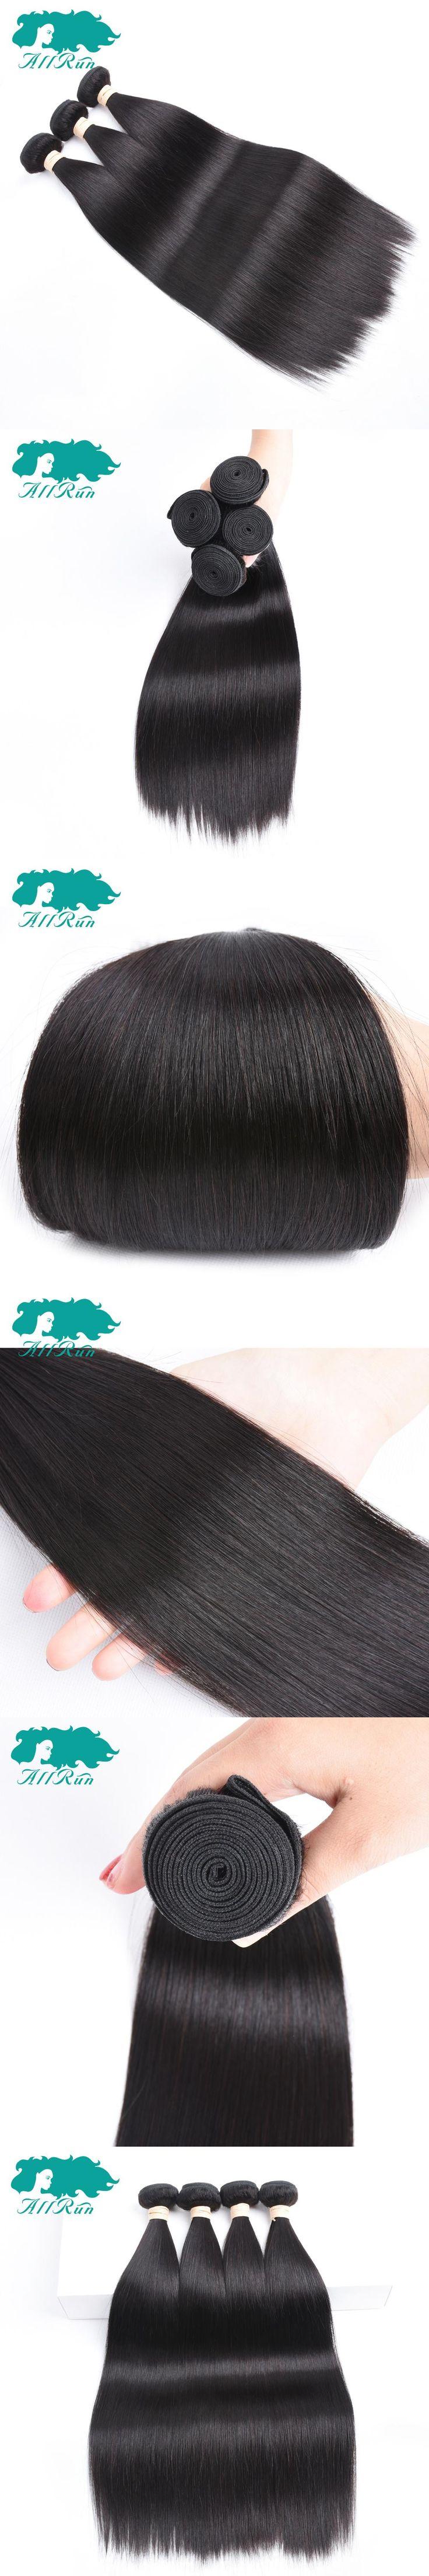 Allrun Pre-Colored Malaysian Straight Hair Natural black Straight Malaysian Hair 4 Bundles one Pack 8-26 inch Shedding Free